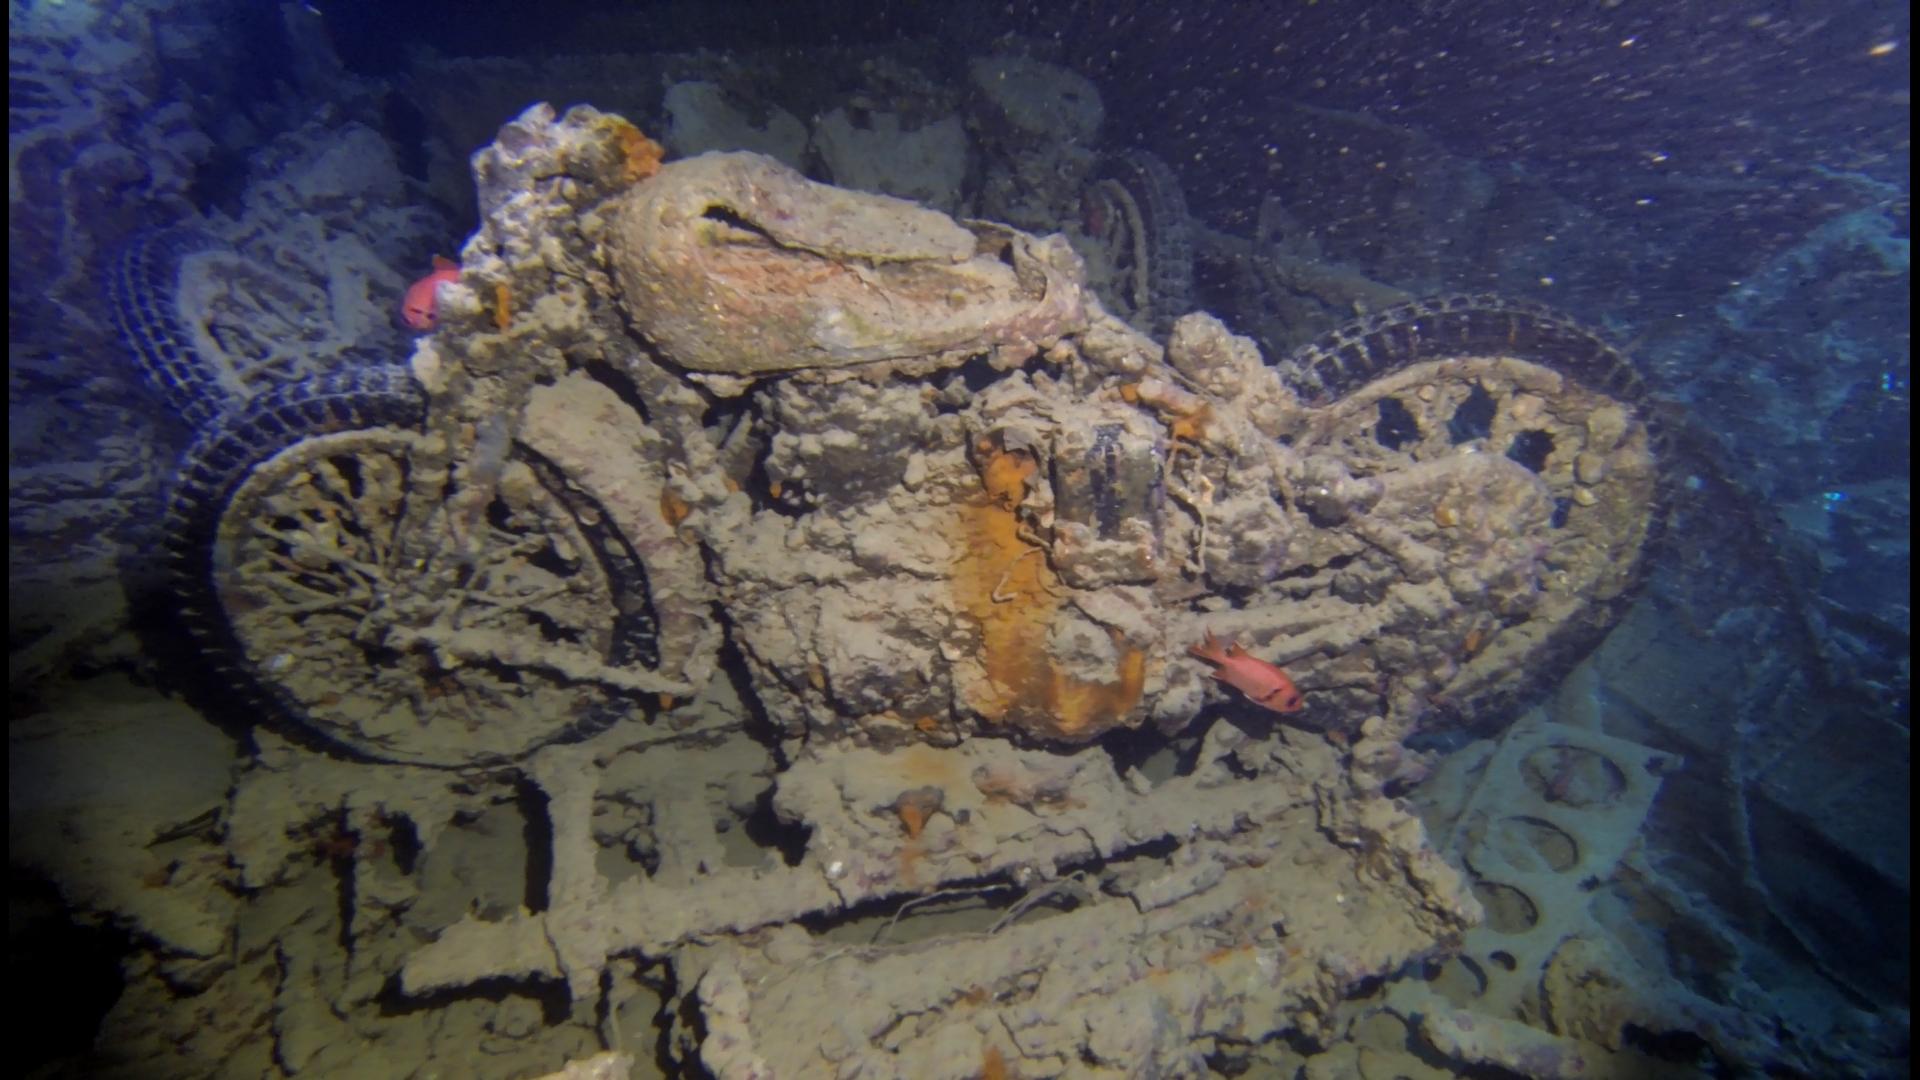 Egypti - Punainenmeri - Hylkysukellus - Thistlegorm